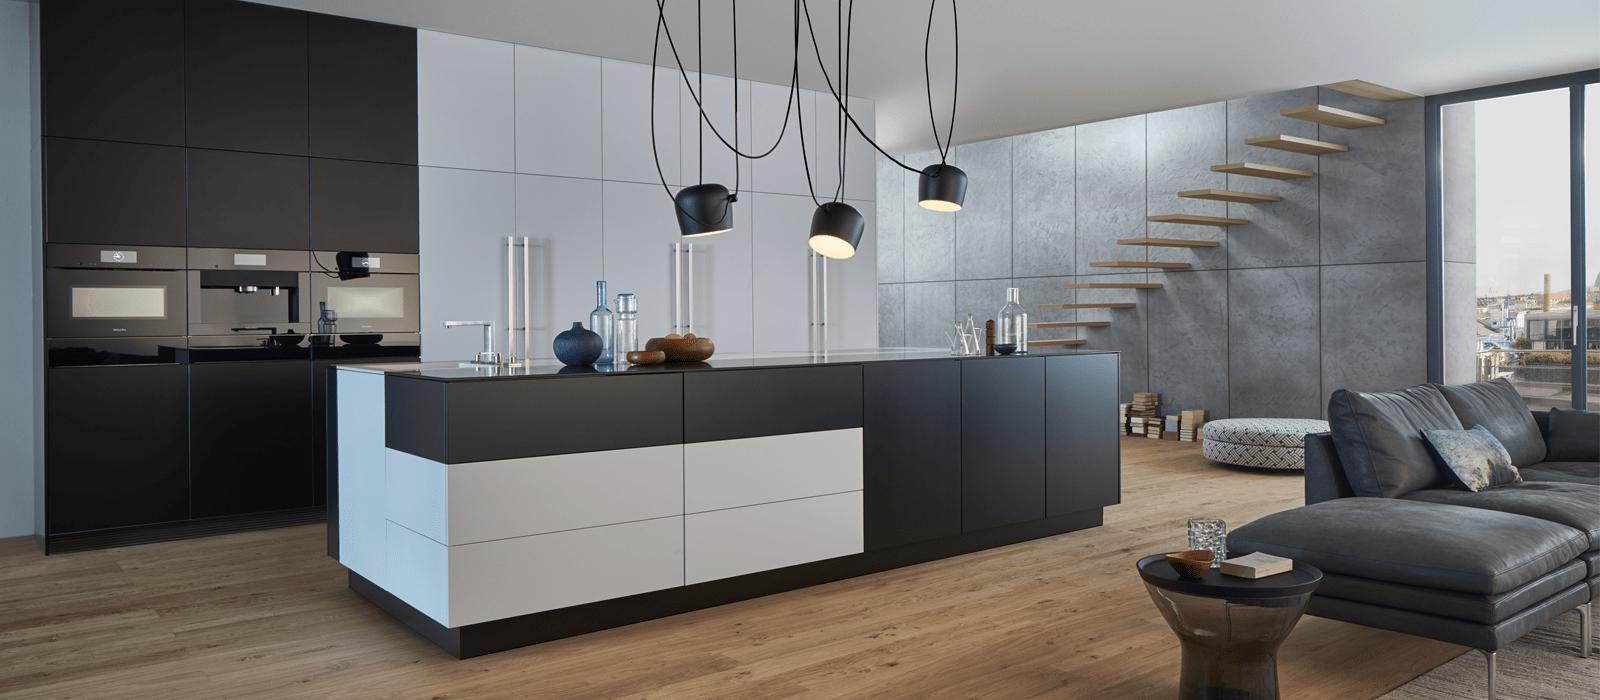 european kitchens kitchen equipment interior design for contemporary 2017 18630 acnn decor of leading nyc modern provider